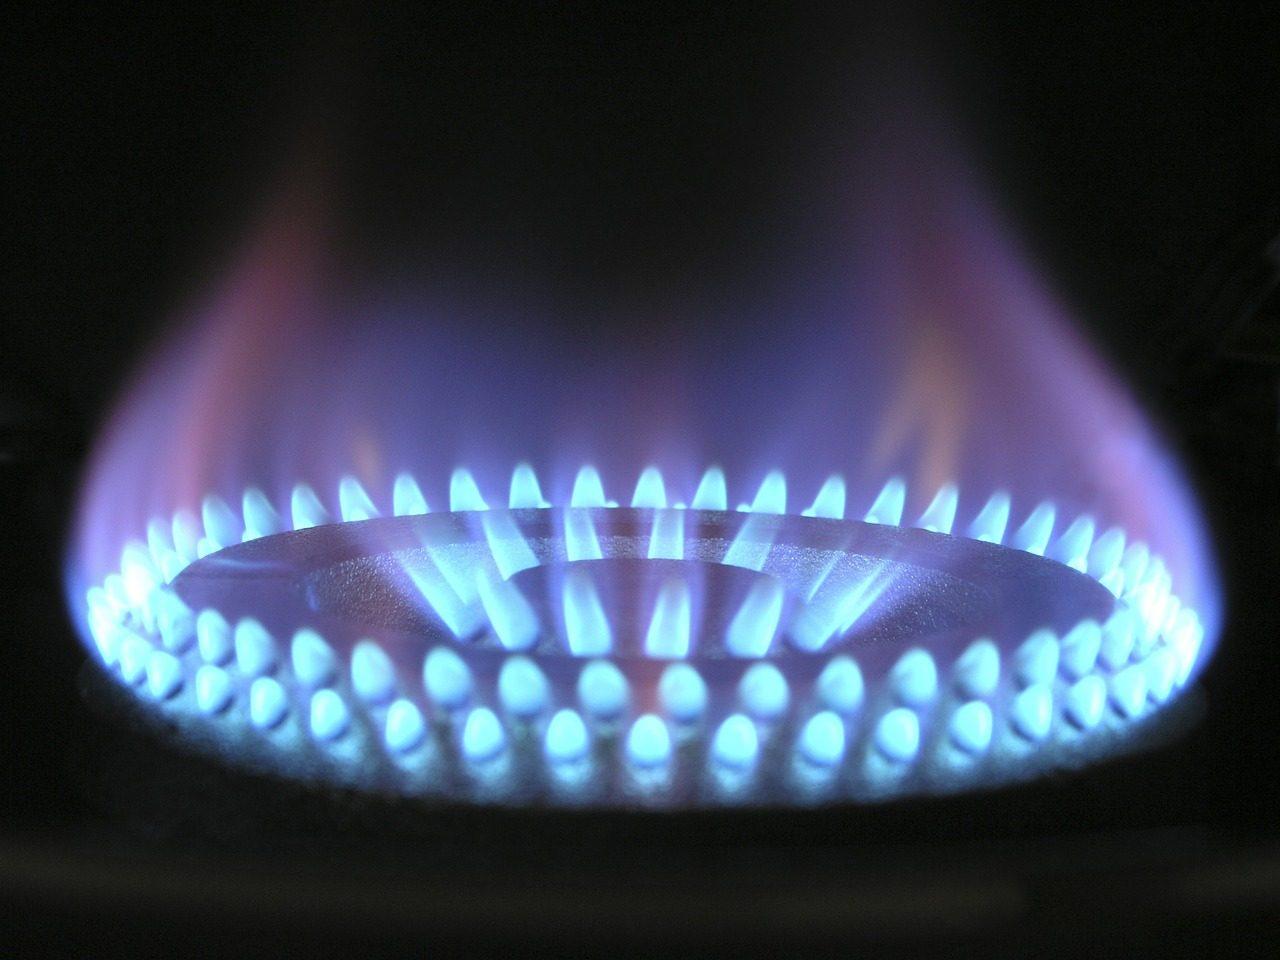 flame-580342_1280-7053844